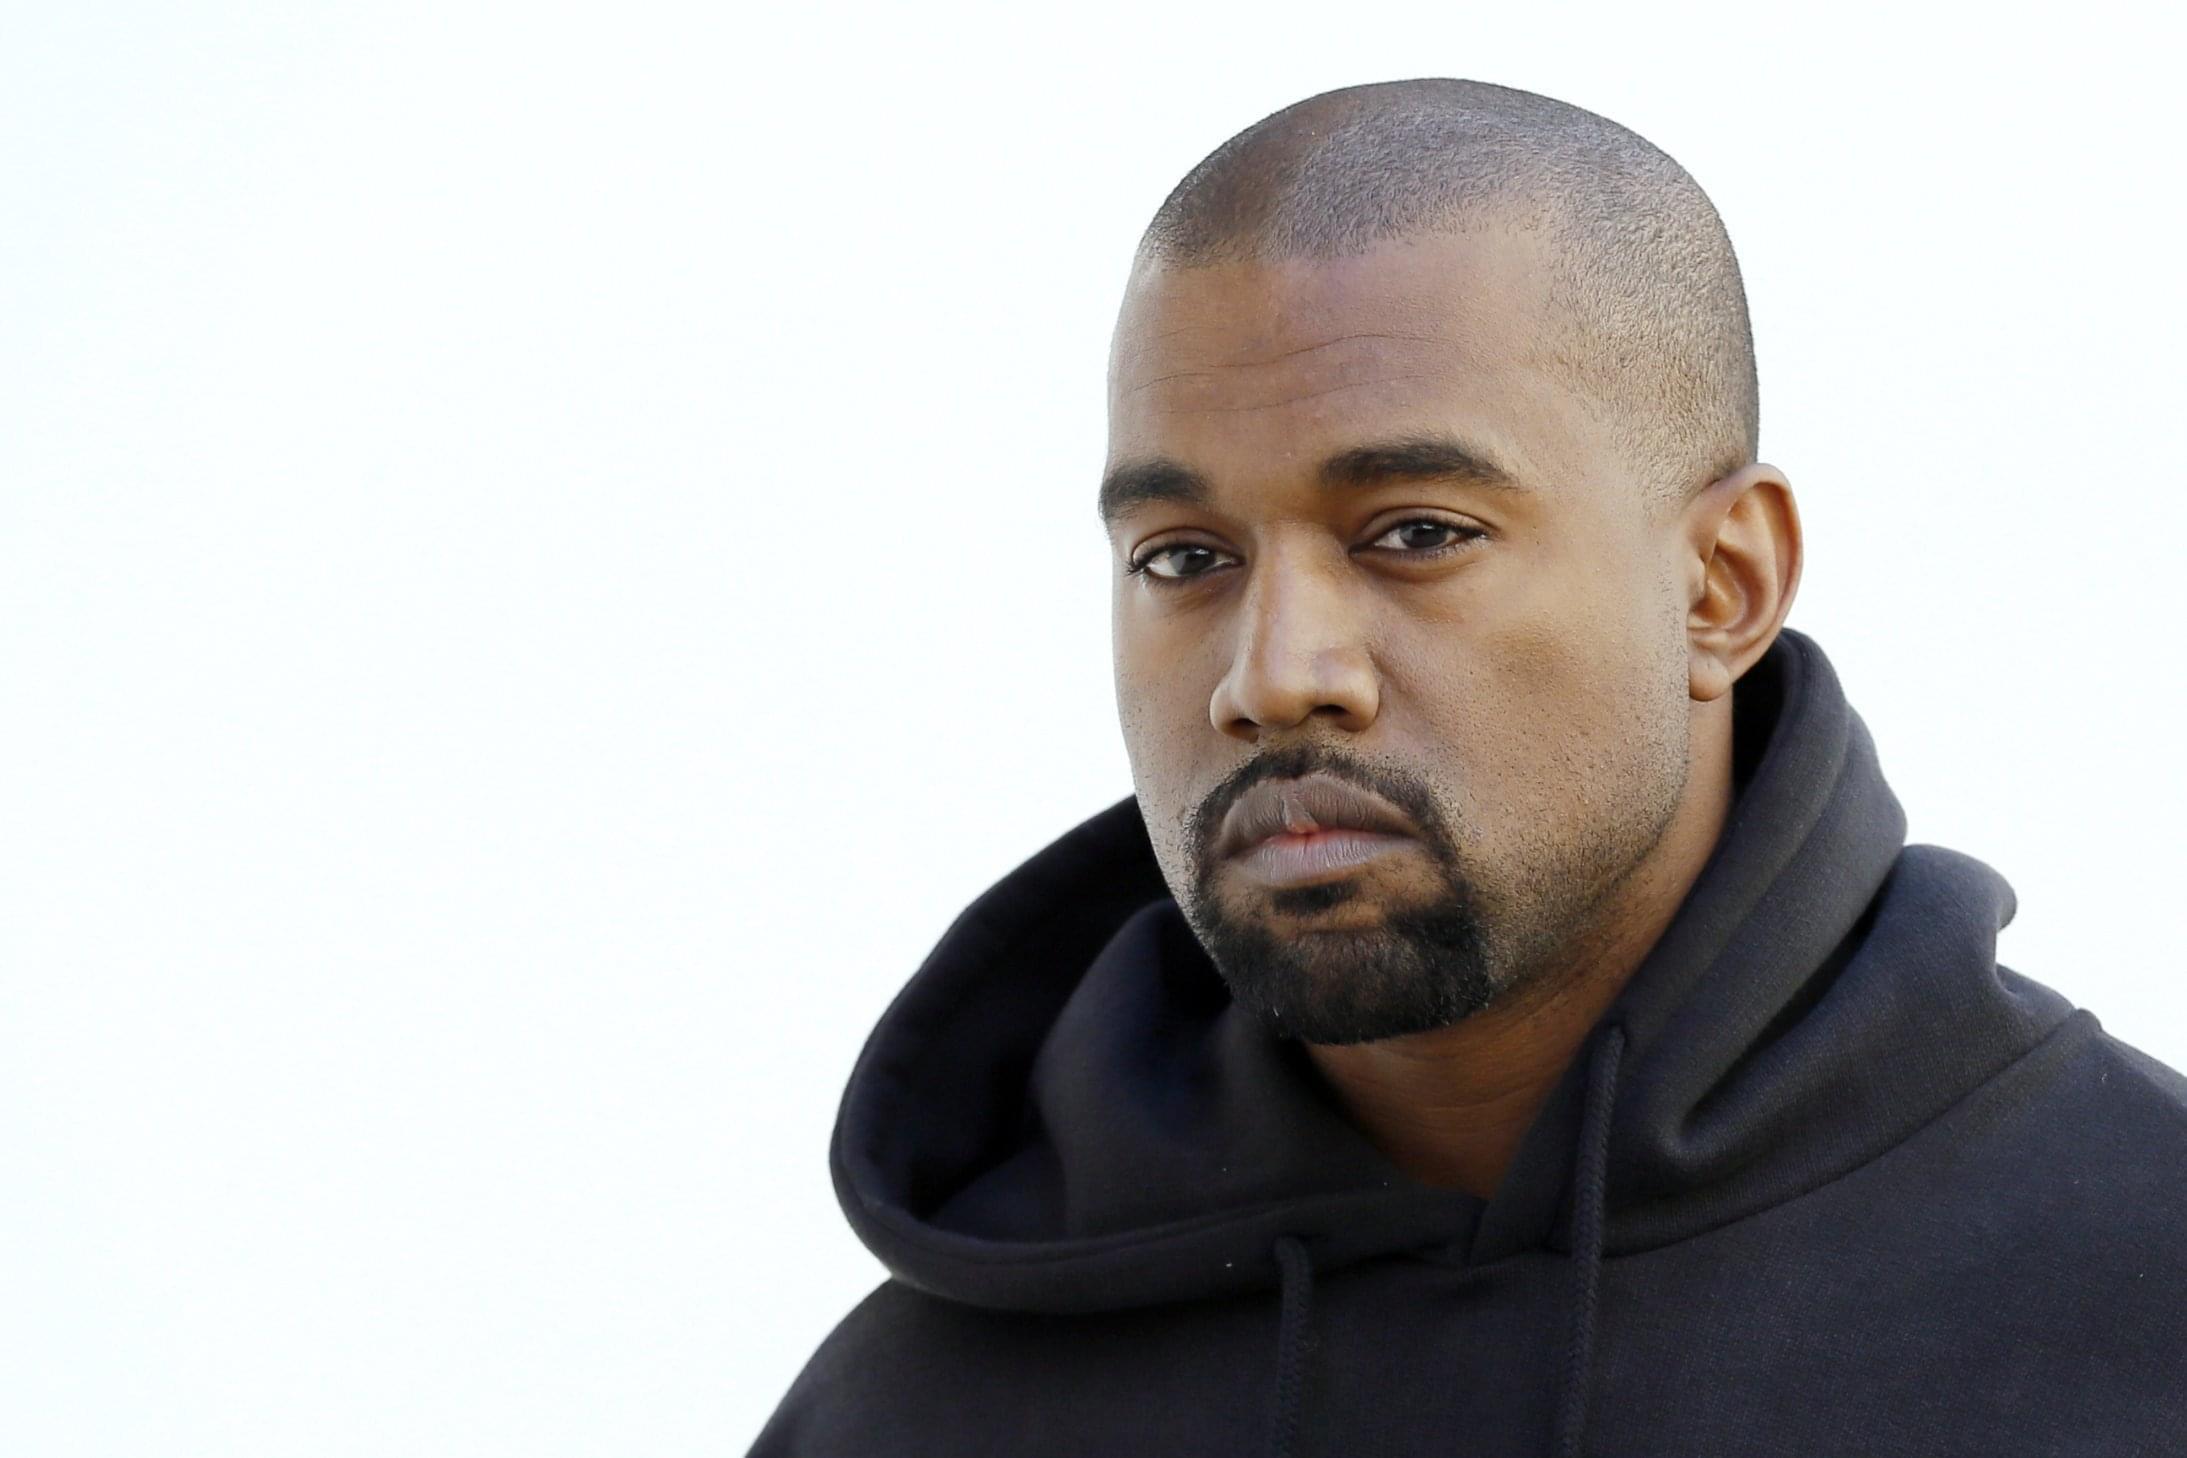 Kanye West Pulls Out Of Coachella 2019